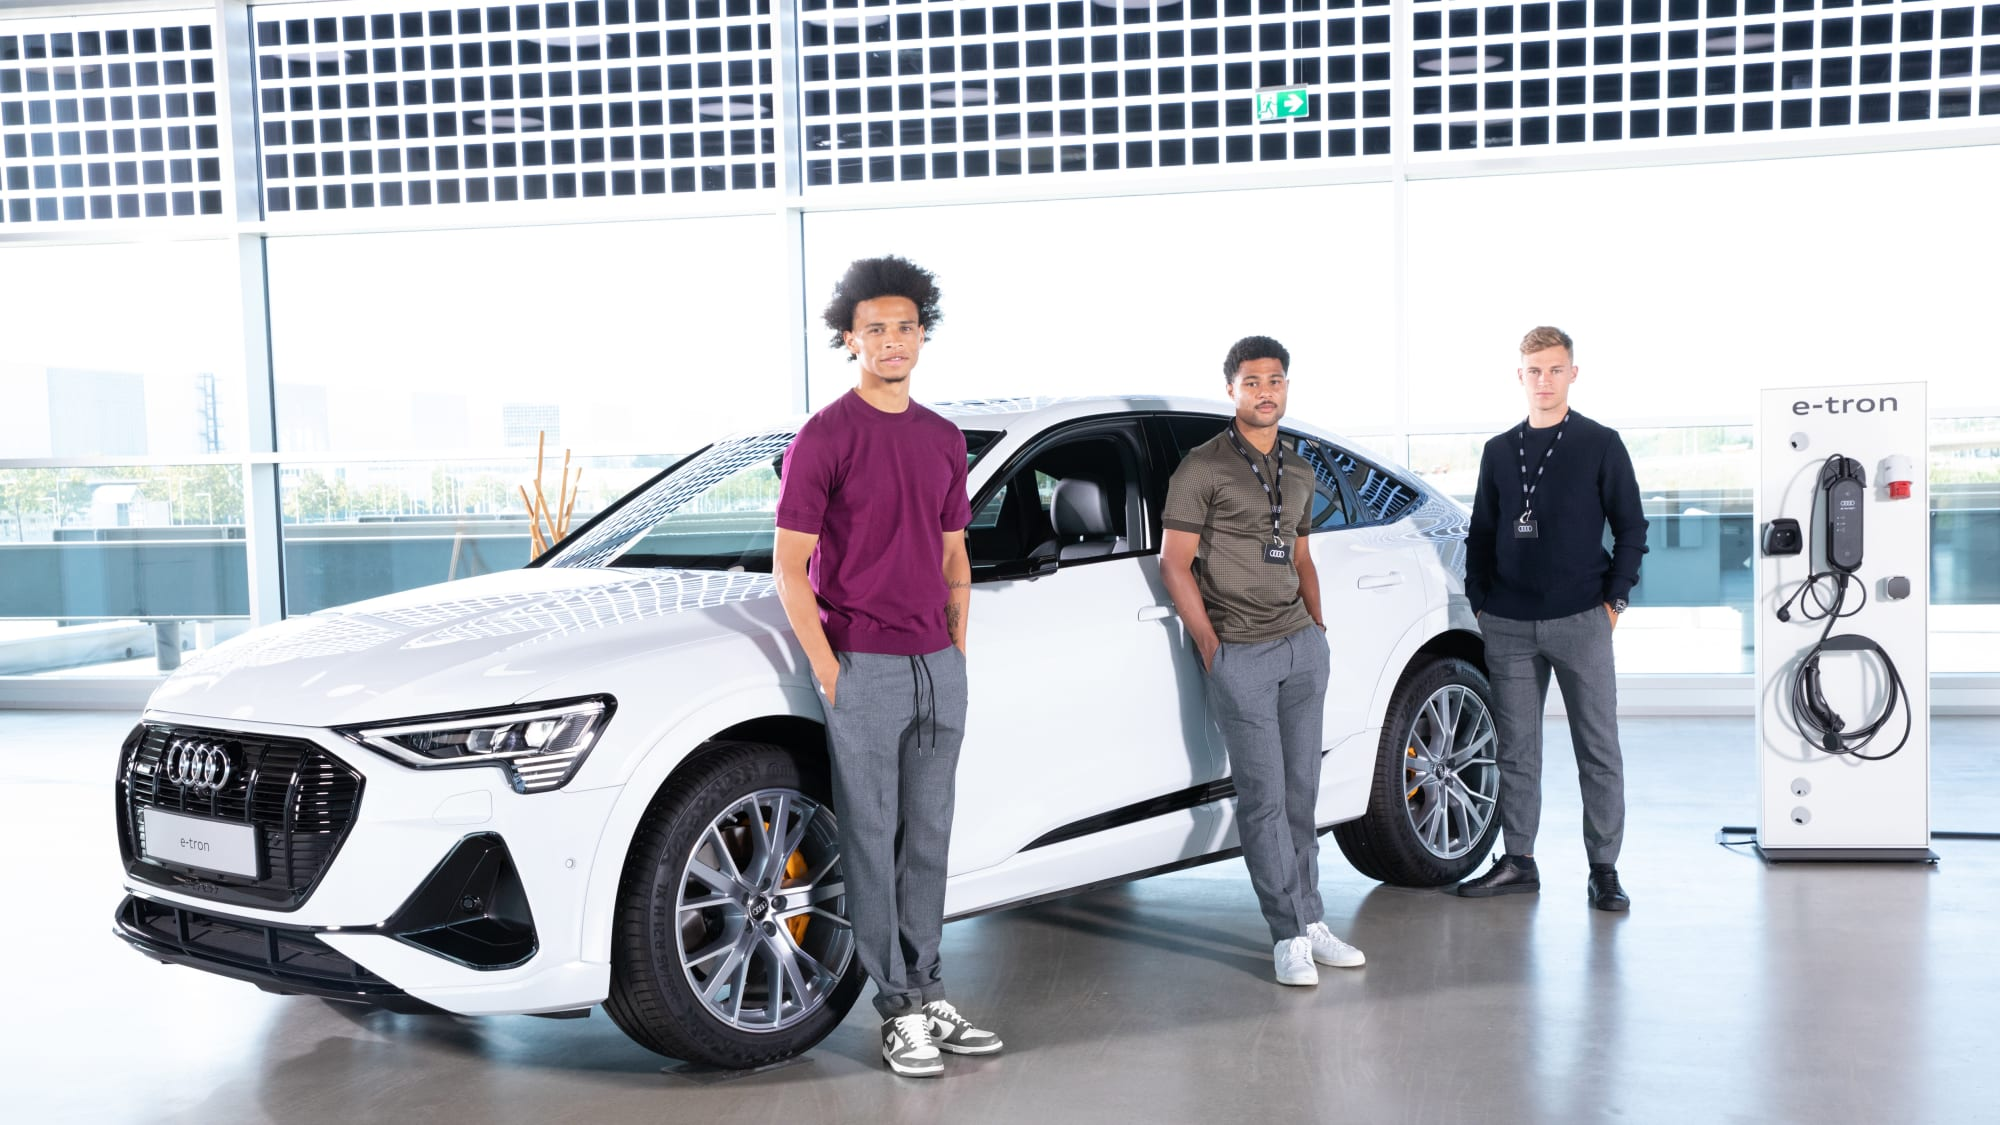 Leroy Sané, Serge Gnabry, Joshua Kimmich stehen vor einem Audi E-Tron